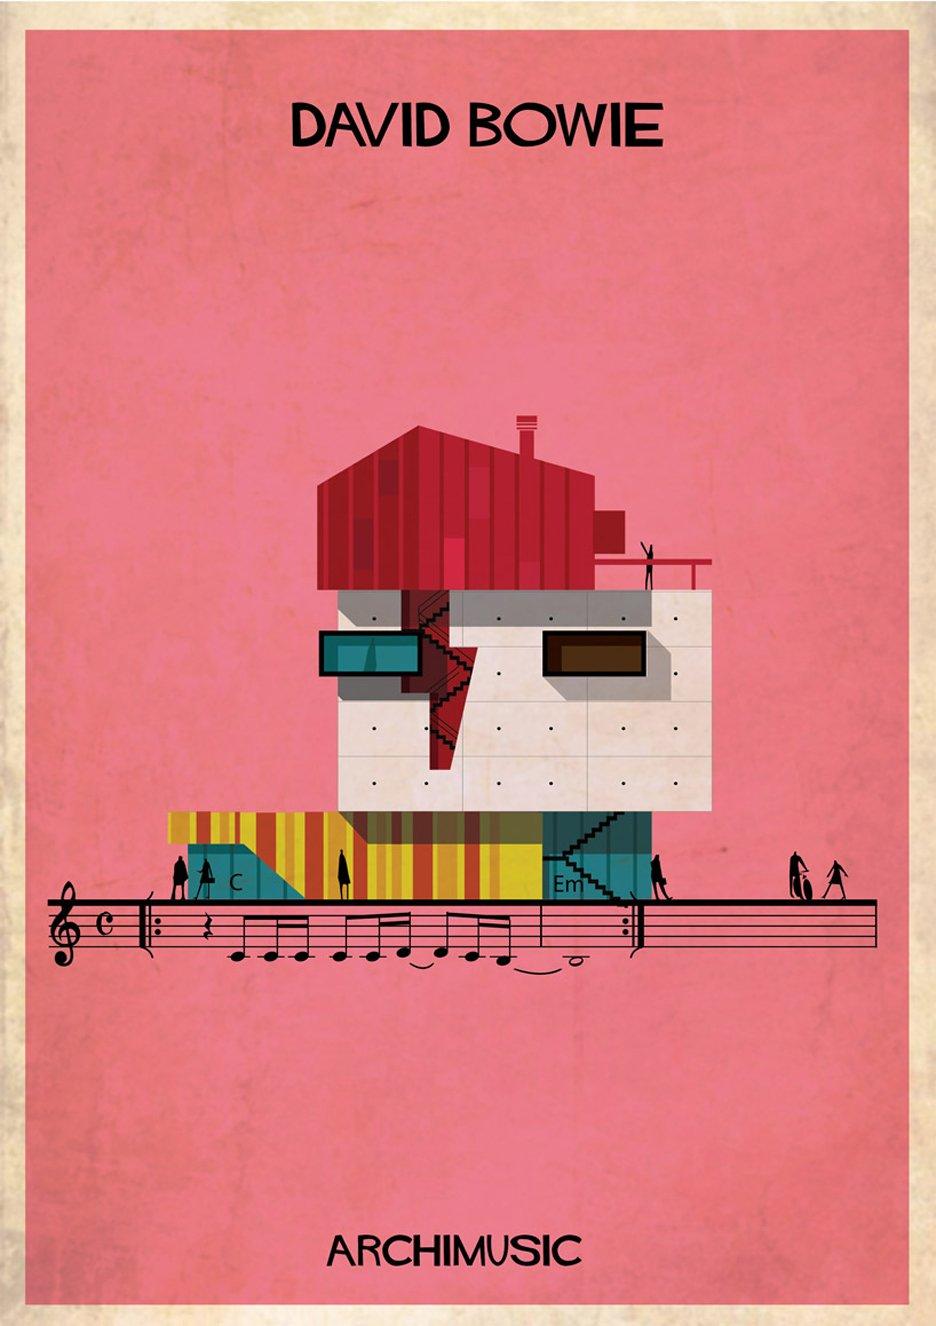 David Bowie Archimusic illustration by Federico Babina